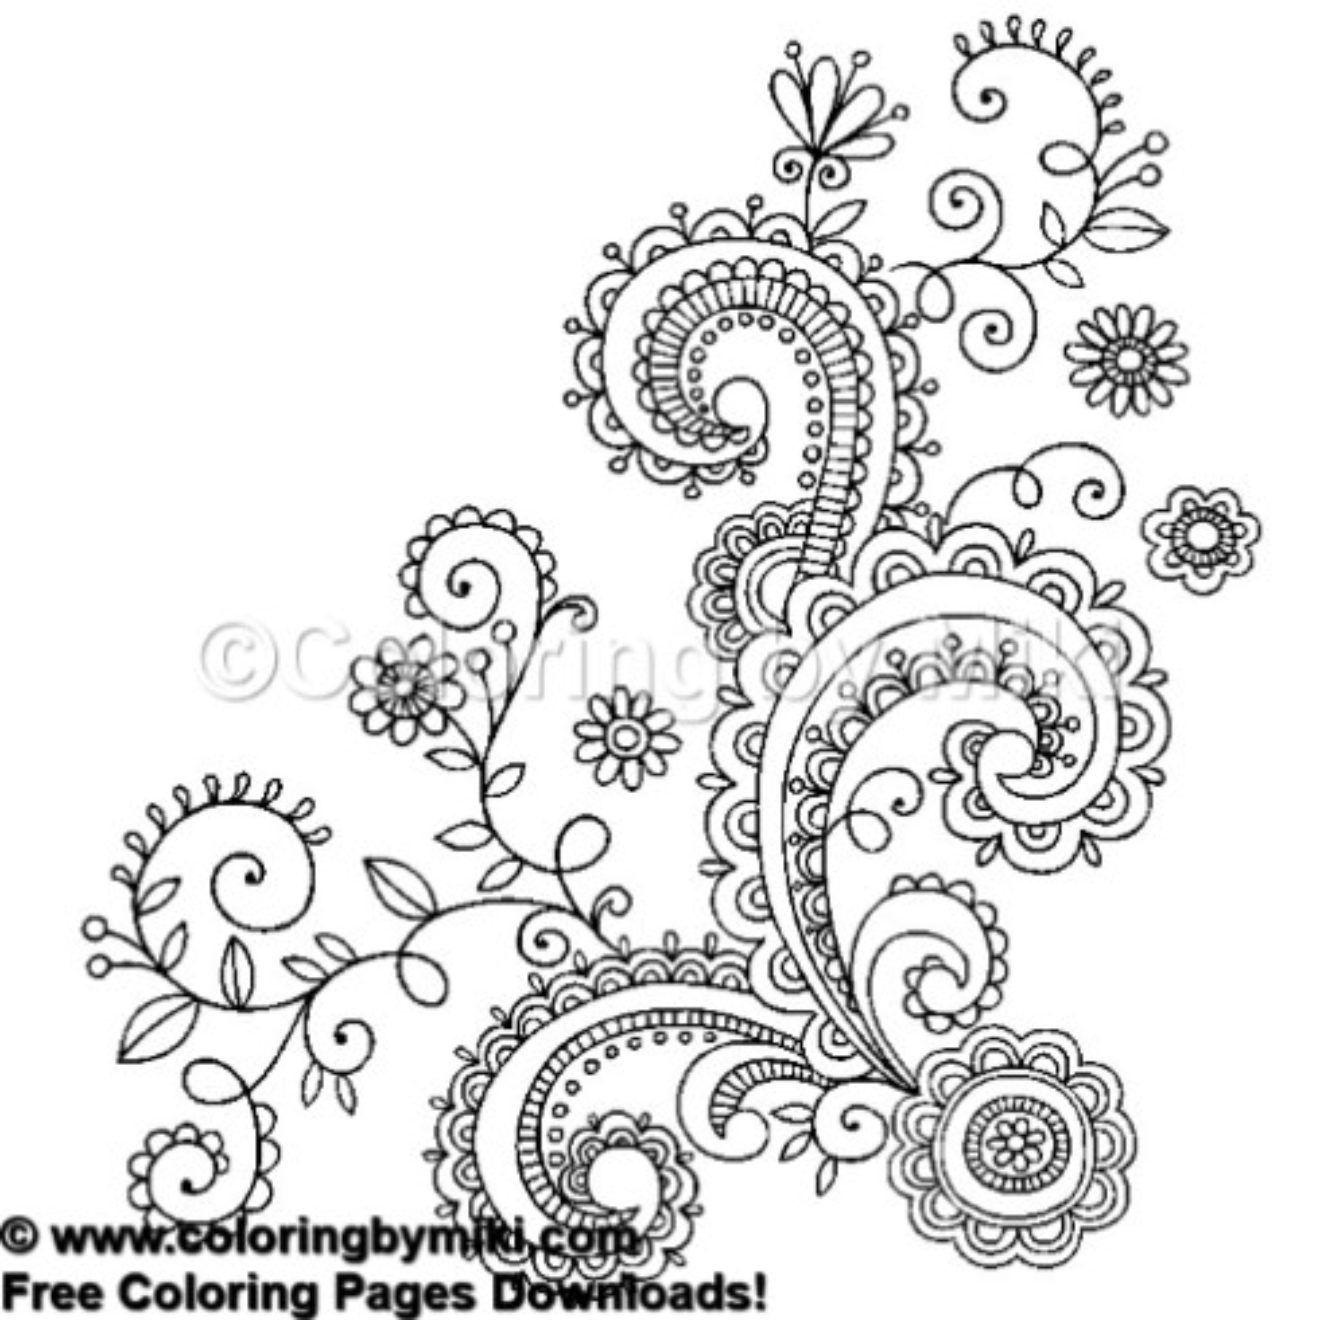 Henna Tattoo Design Coloring Page #653   Boho / Tribal - Free - Free Printable Henna Tattoo Designs